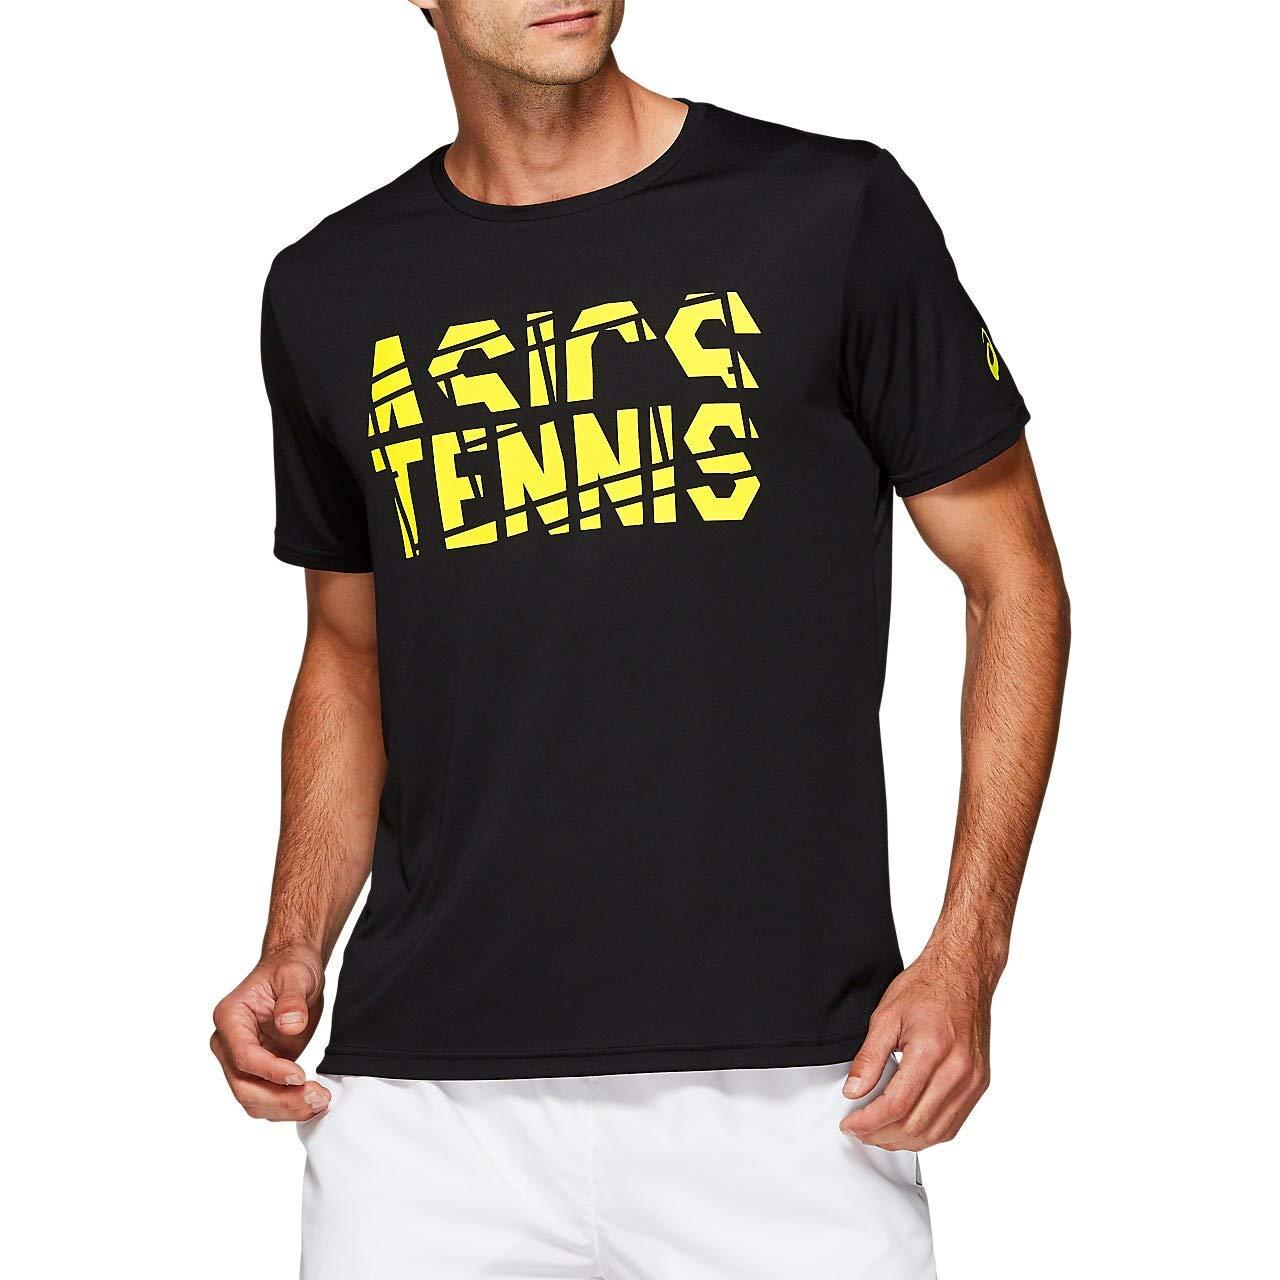 ASICS Men's Practice Short Sleeve Top, Performance Black/Sour Yuzu - Medium